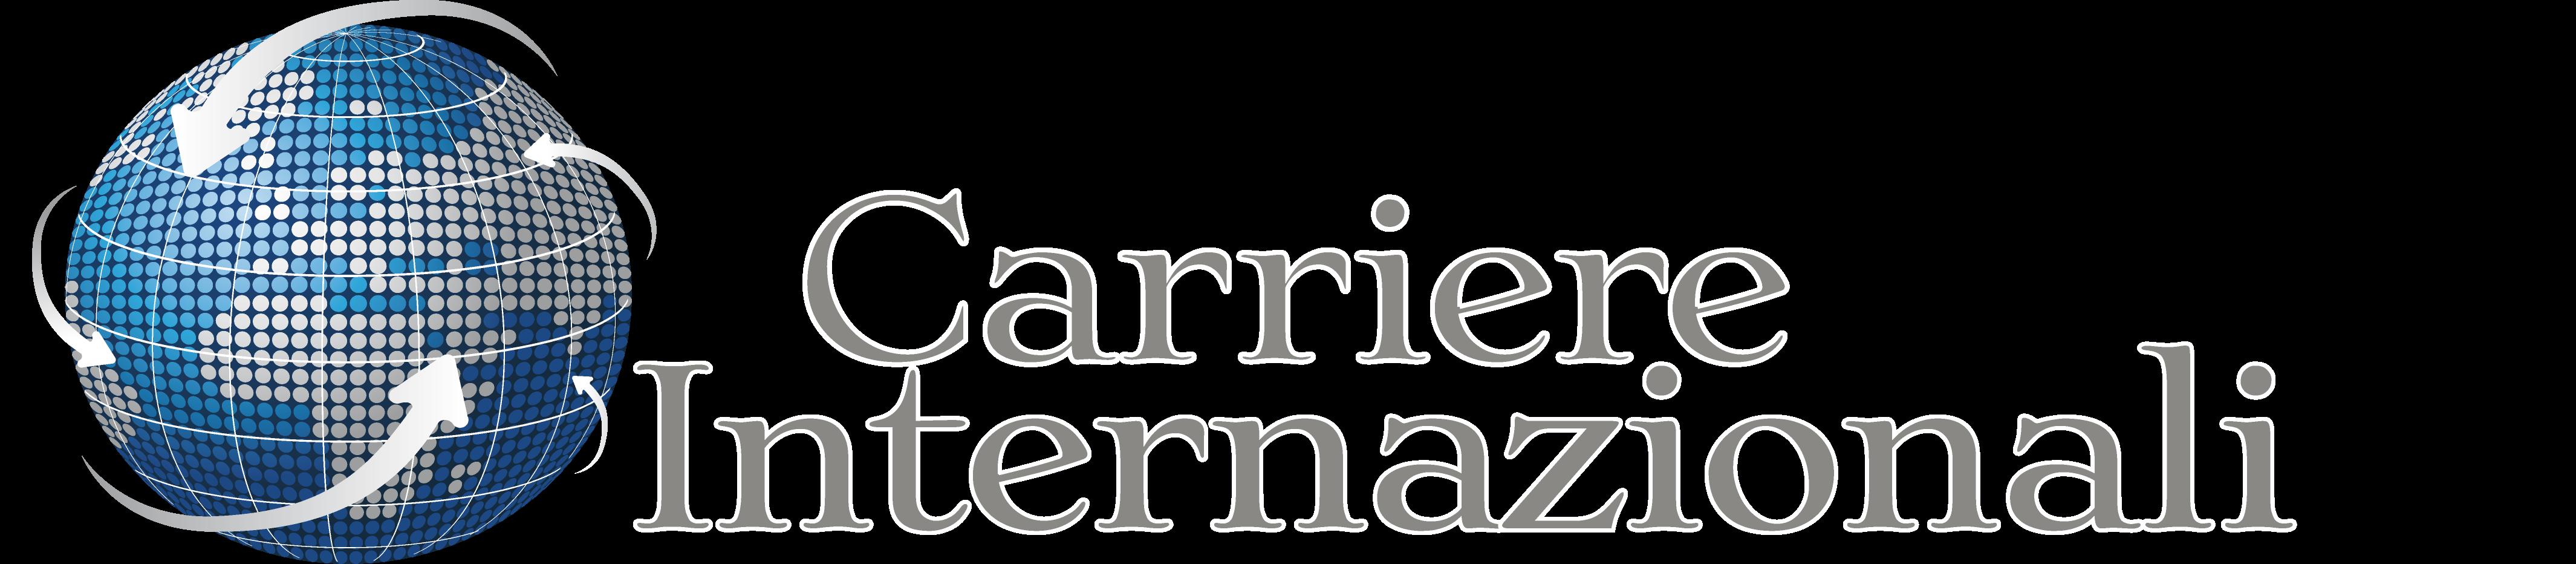 「Carriere Internazionali」的圖片搜尋結果